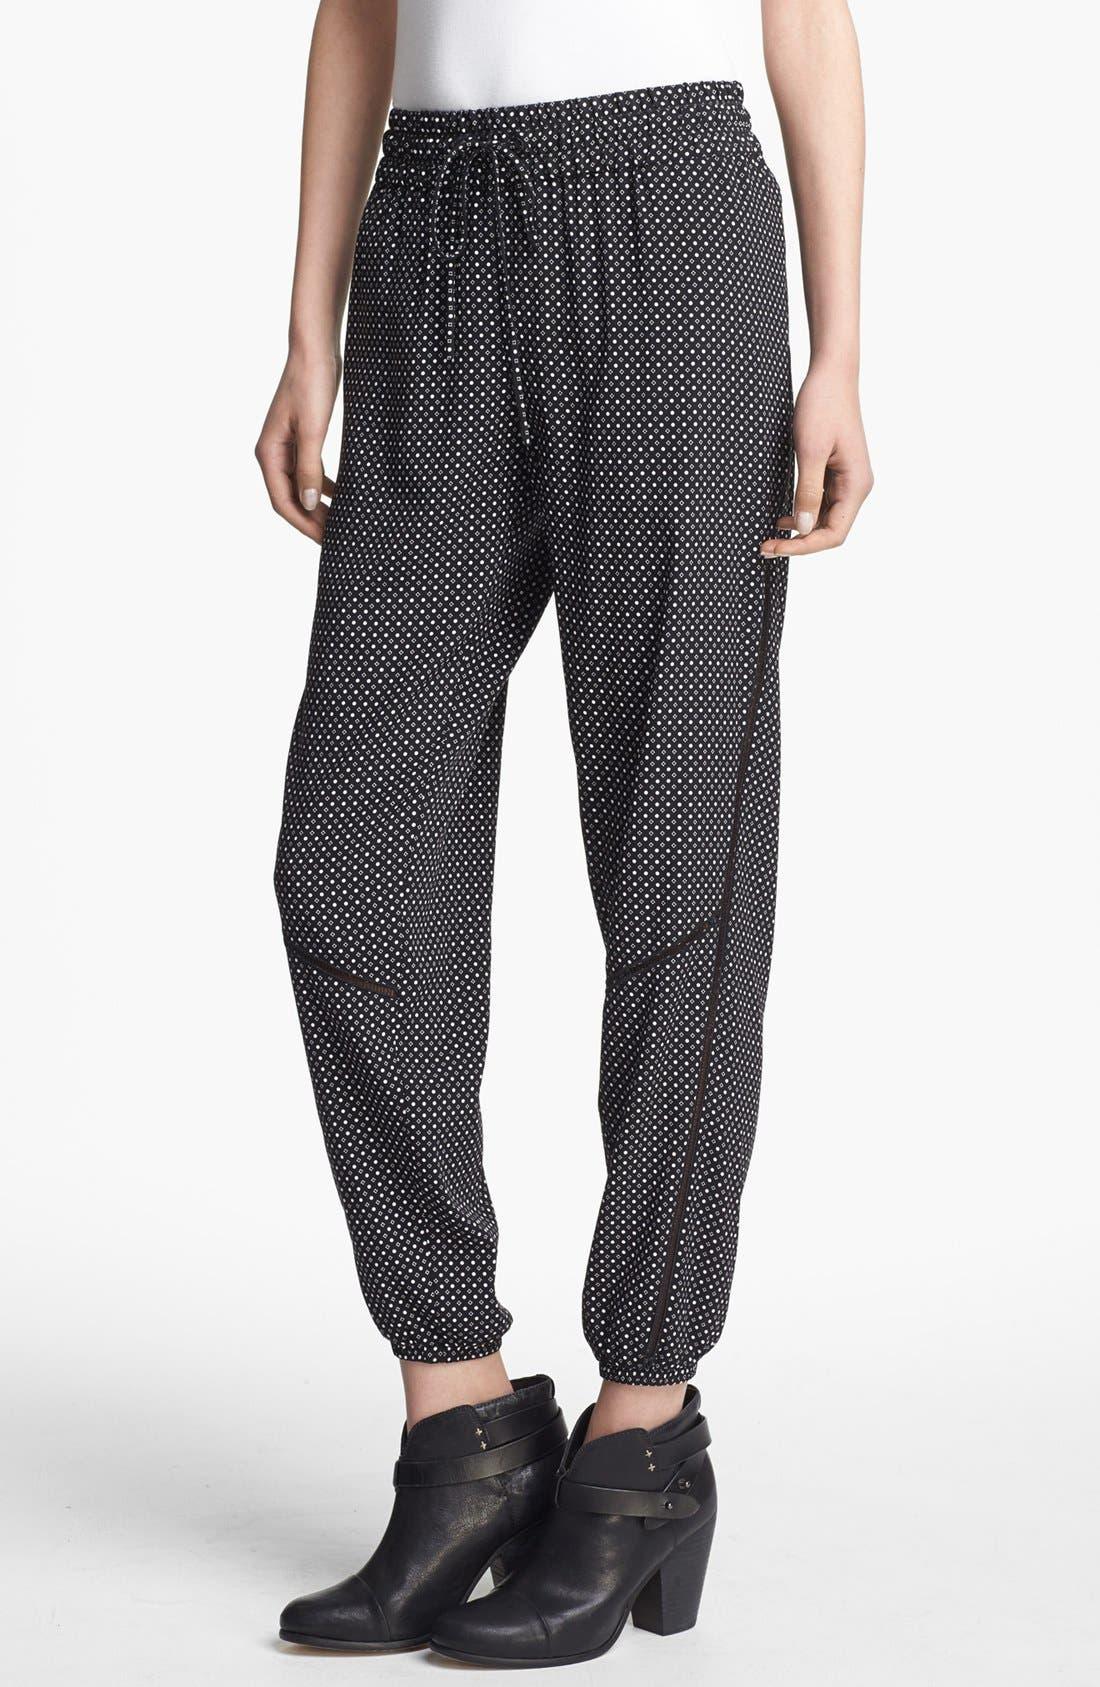 Alternate Image 1 Selected - rag & bone 'Gina' Silk Track Pants